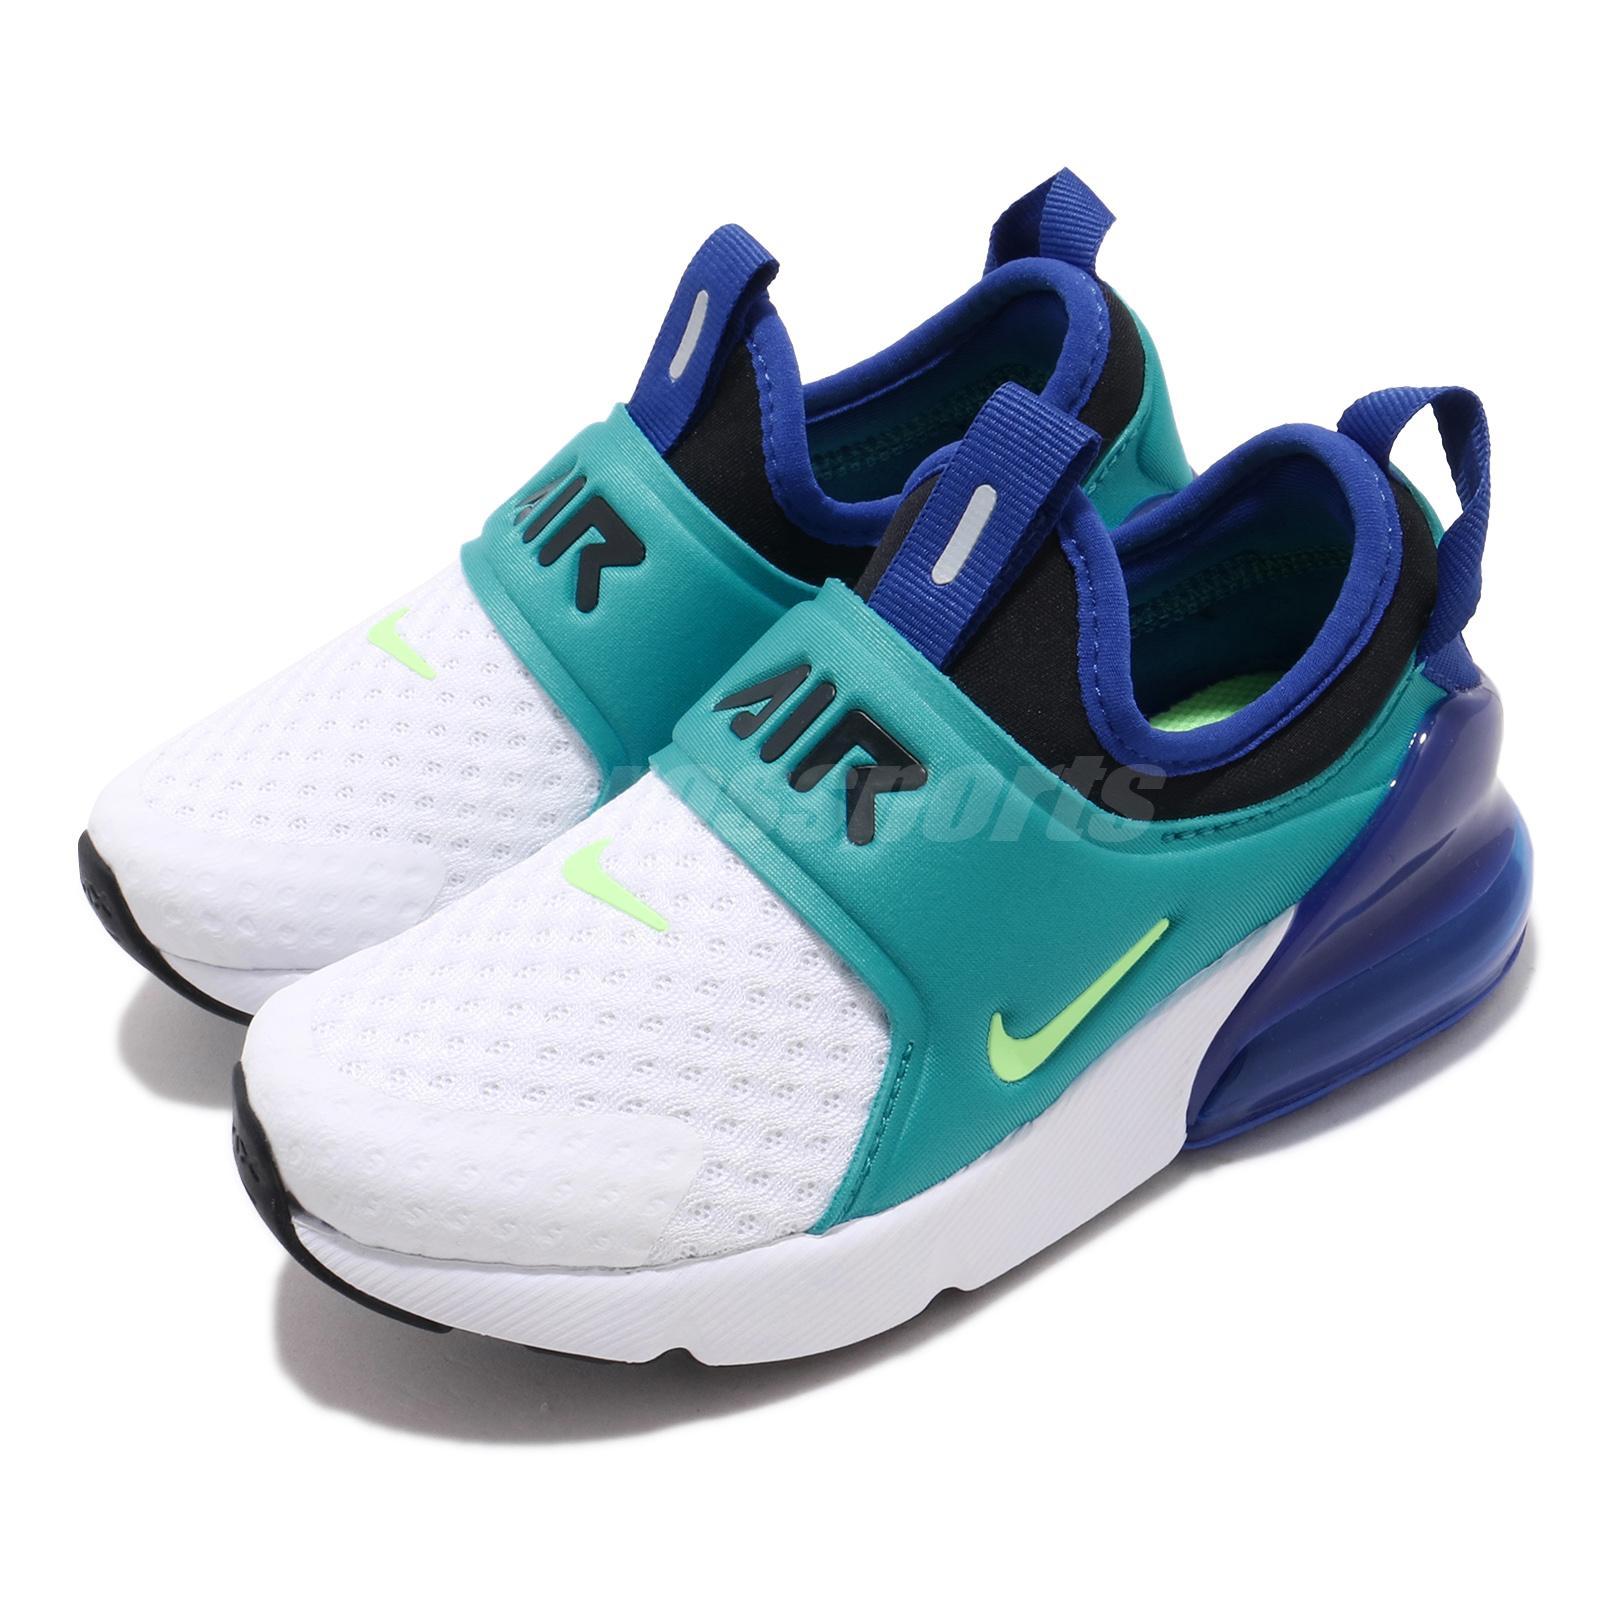 Nike Air Max 270 Extreme Ps White Green Aqua Blue Kid Preschool Shoes Ci1107 101 Ebay